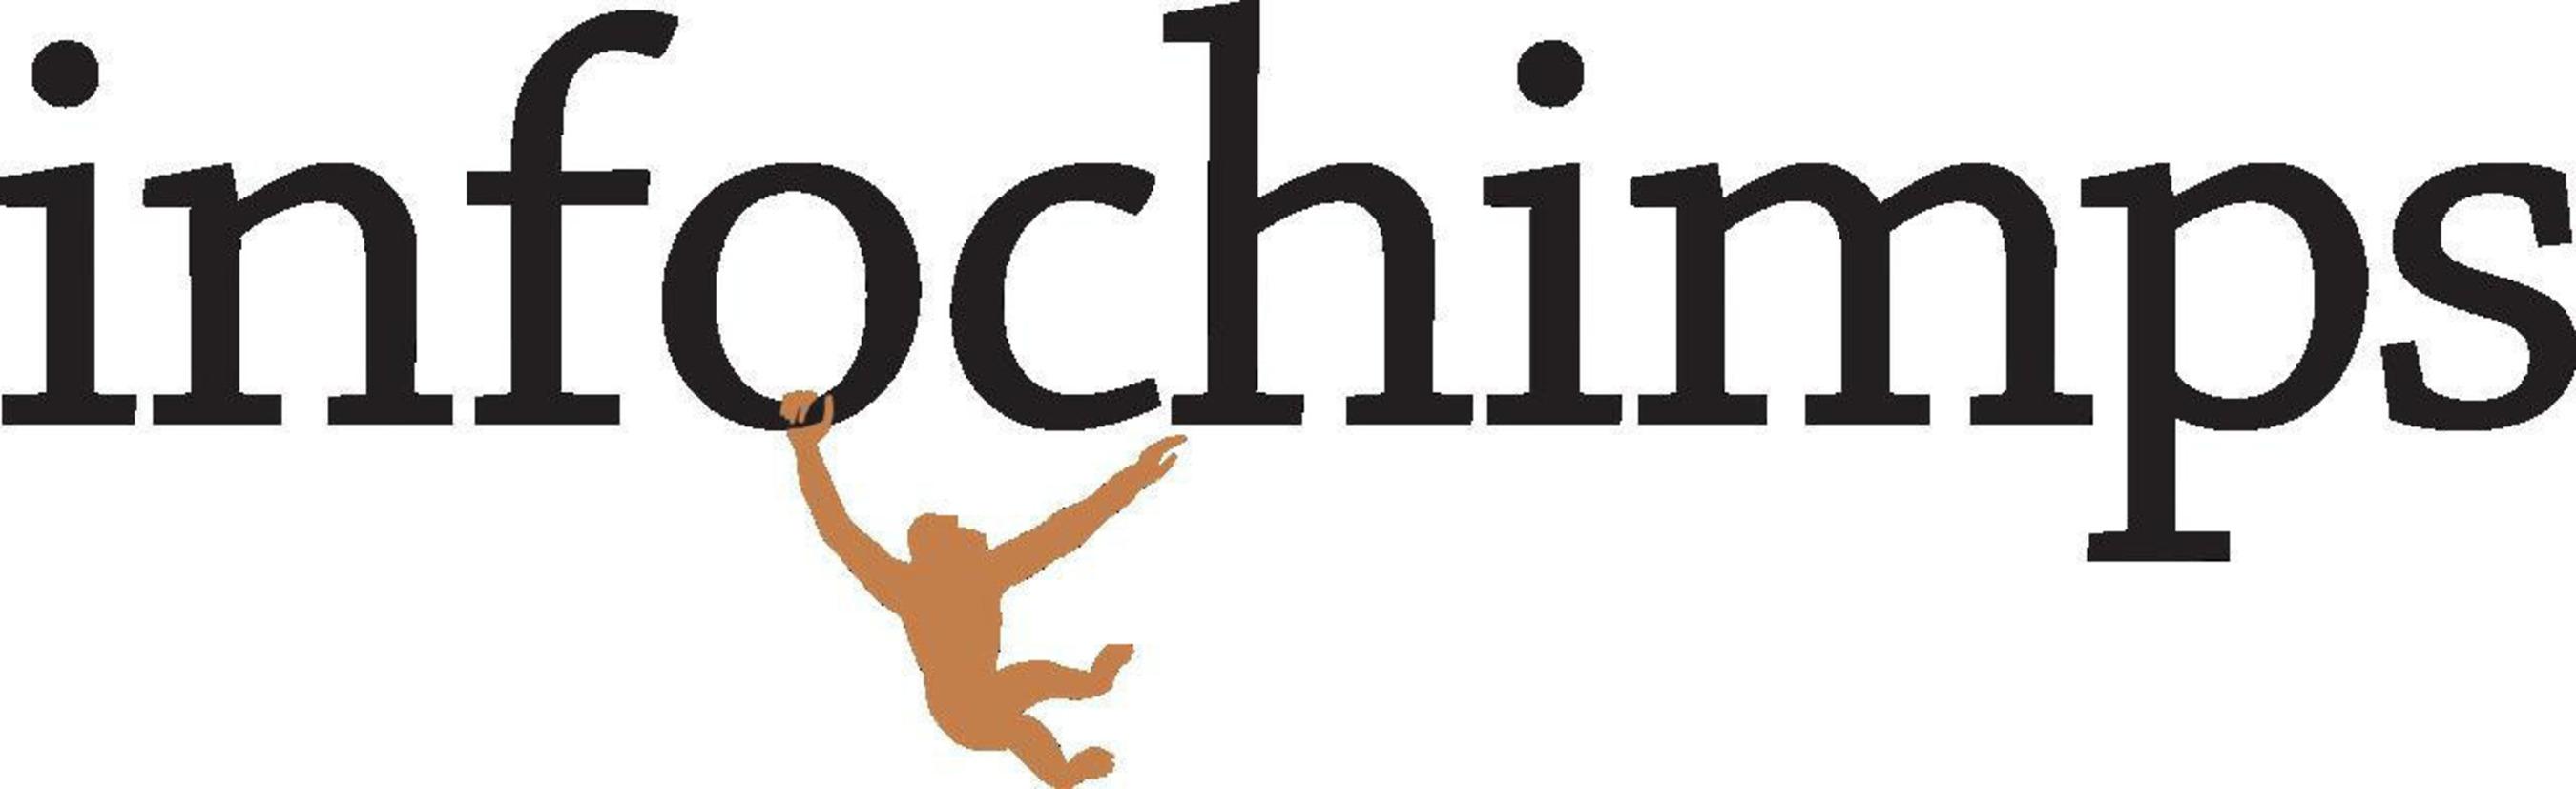 Infochimps. (PRNewsFoto/Infochimps) (PRNewsFoto/INFOCHIMPS)